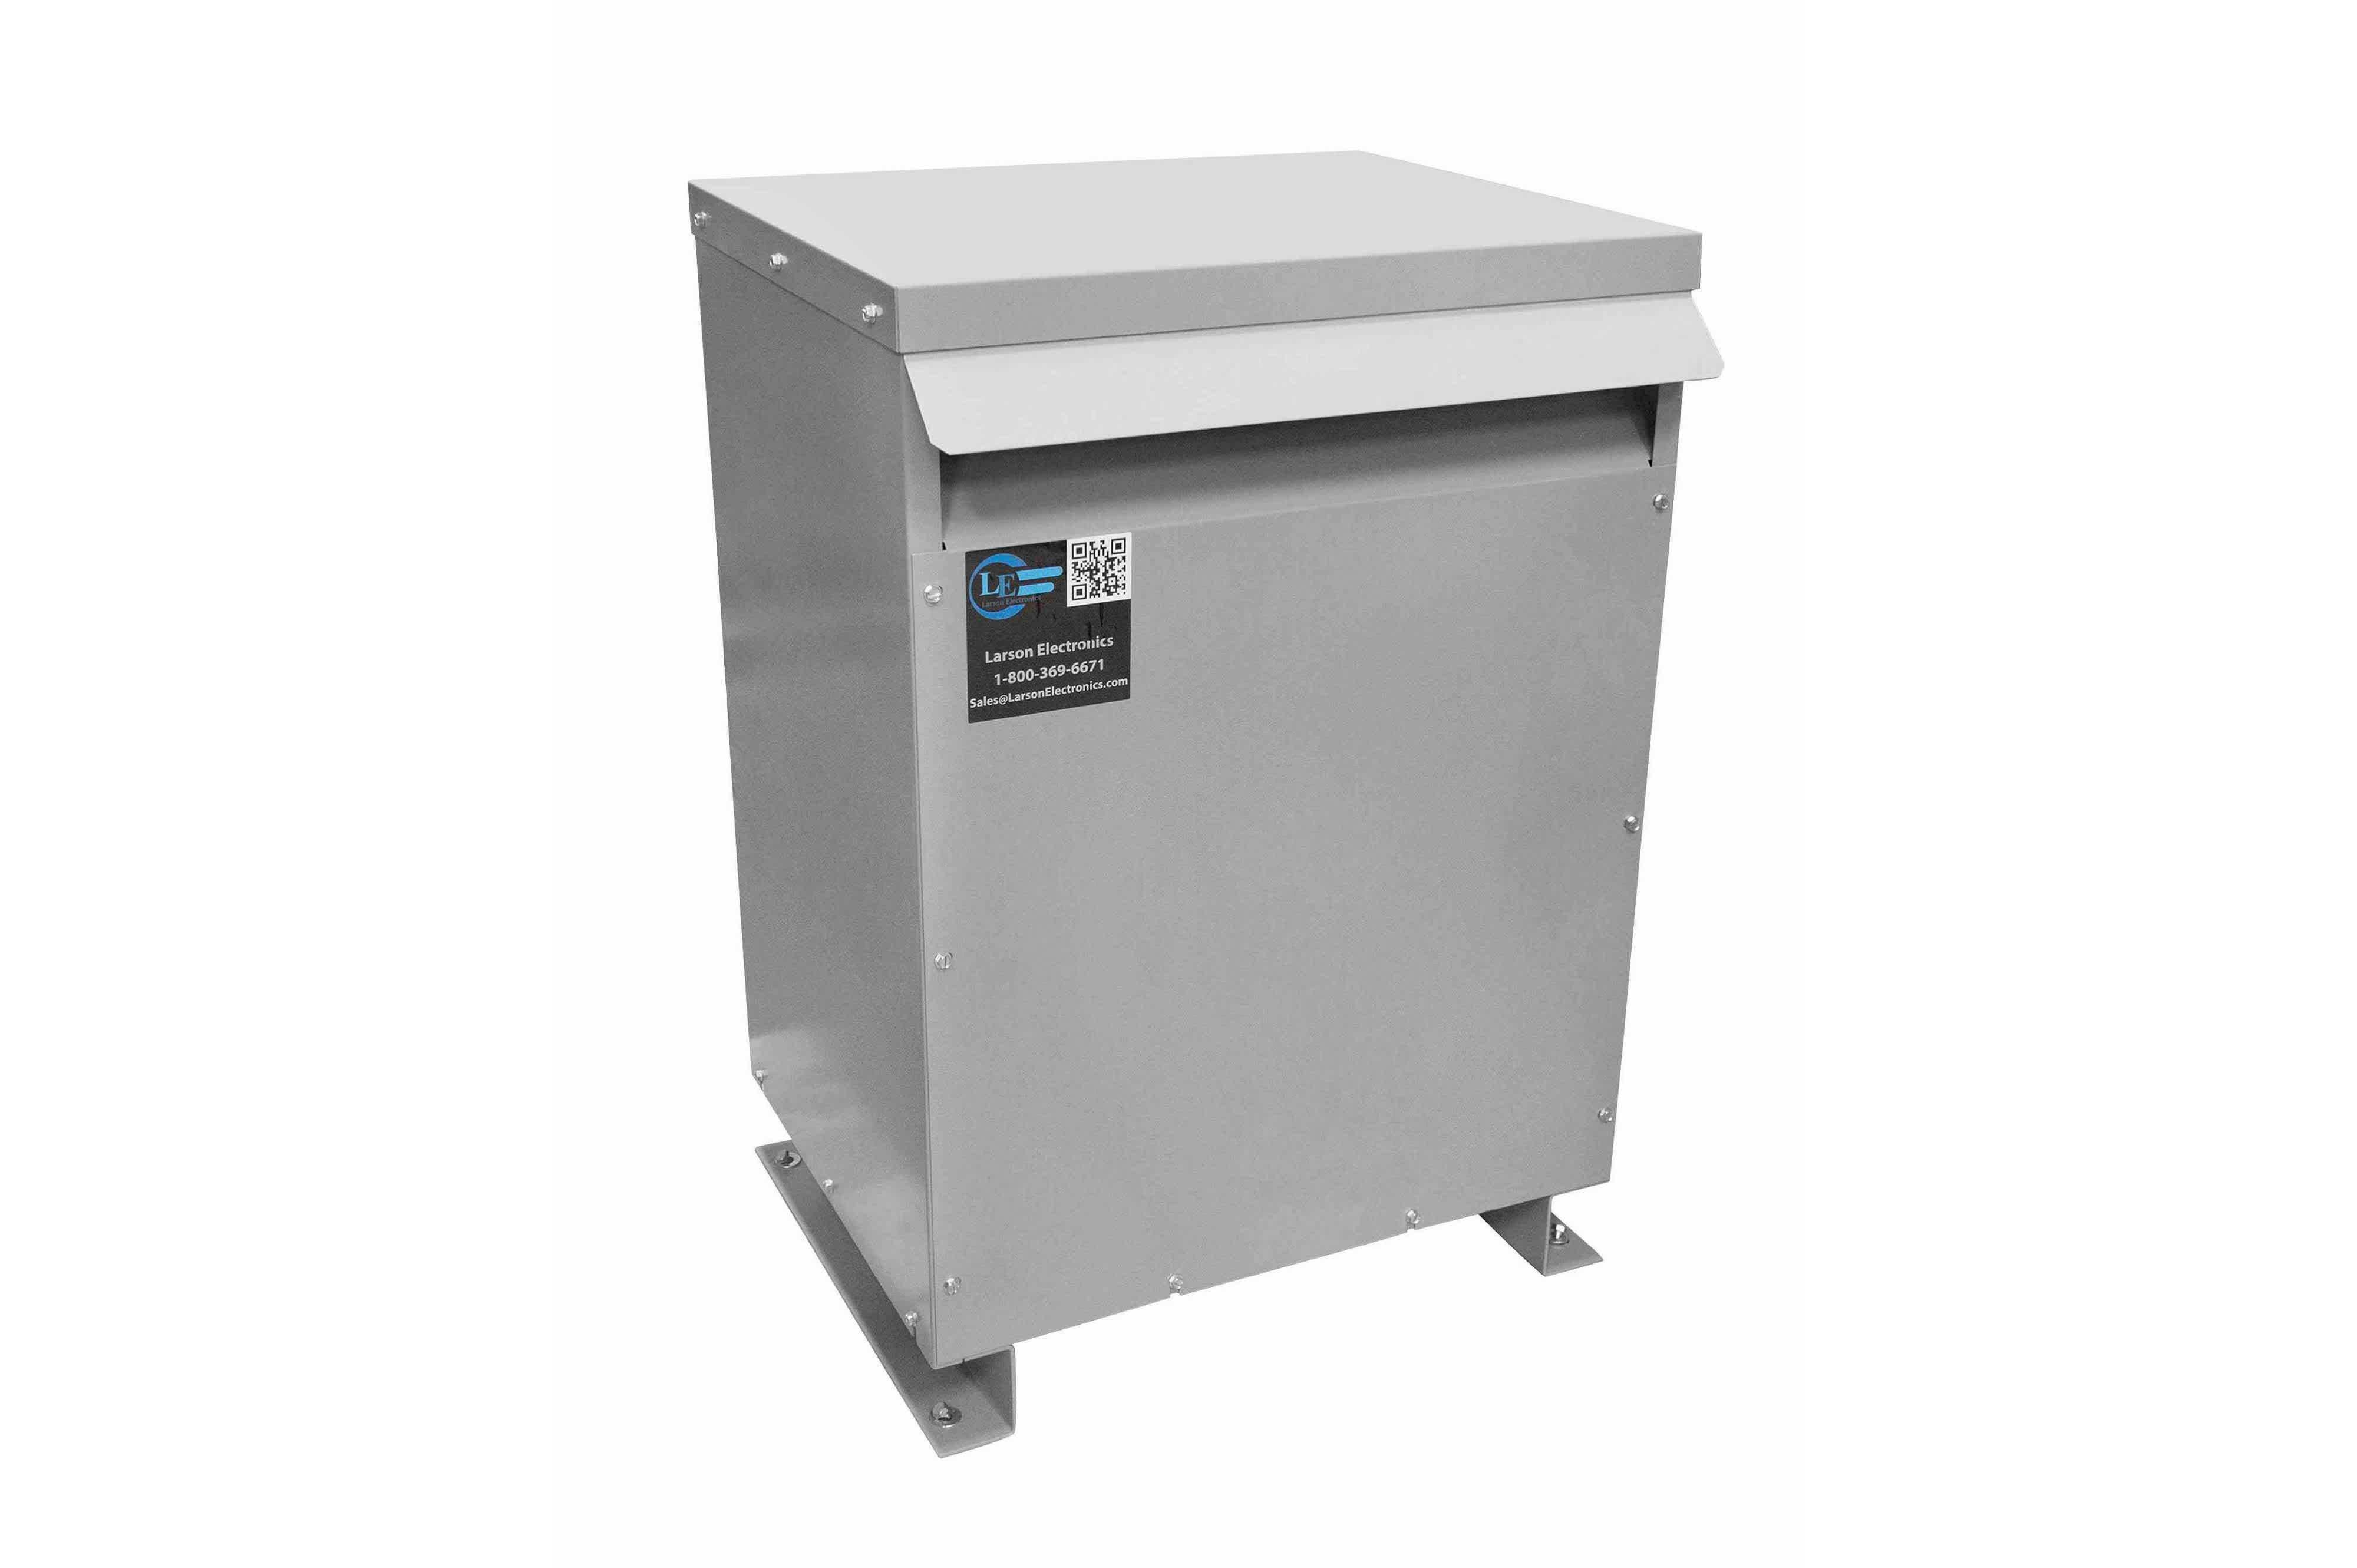 65 kVA 3PH Isolation Transformer, 600V Wye Primary, 208V Delta Secondary, N3R, Ventilated, 60 Hz